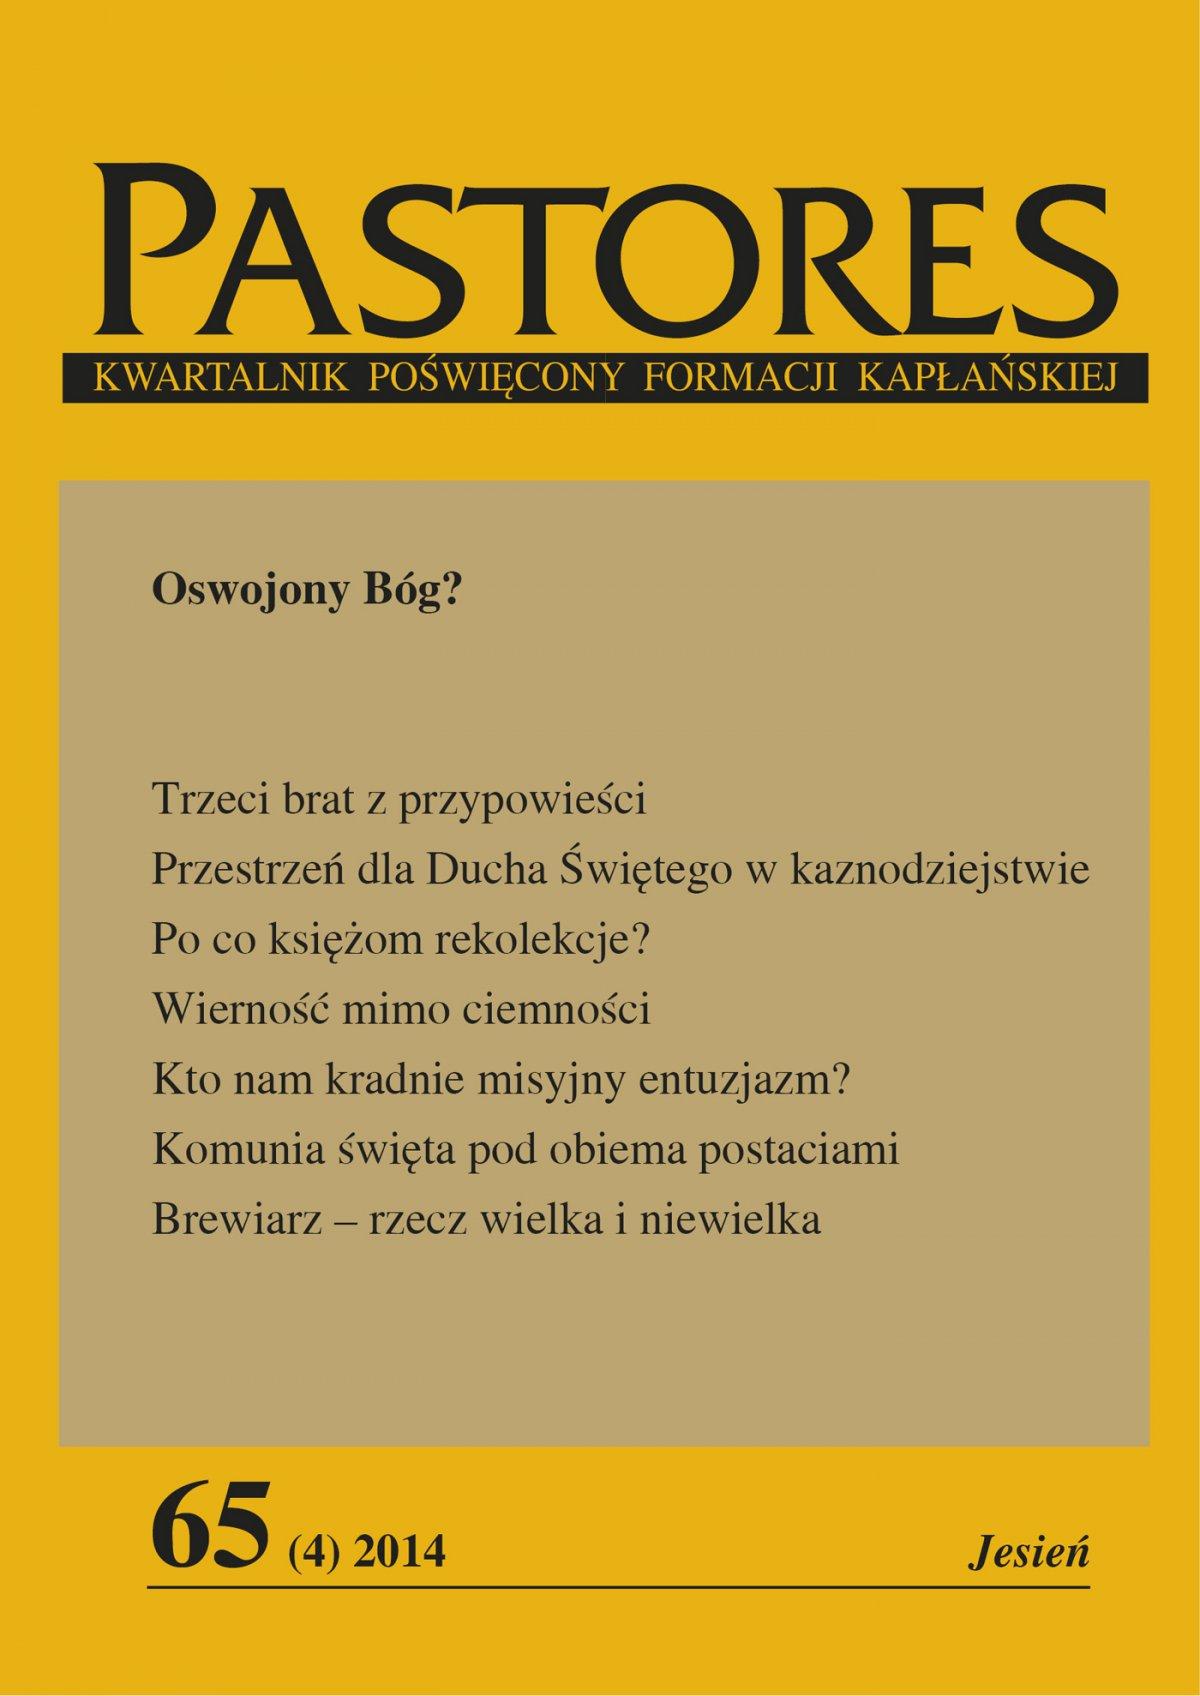 Pastores nr 65 - Ebook (Książka na Kindle) do pobrania w formacie MOBI